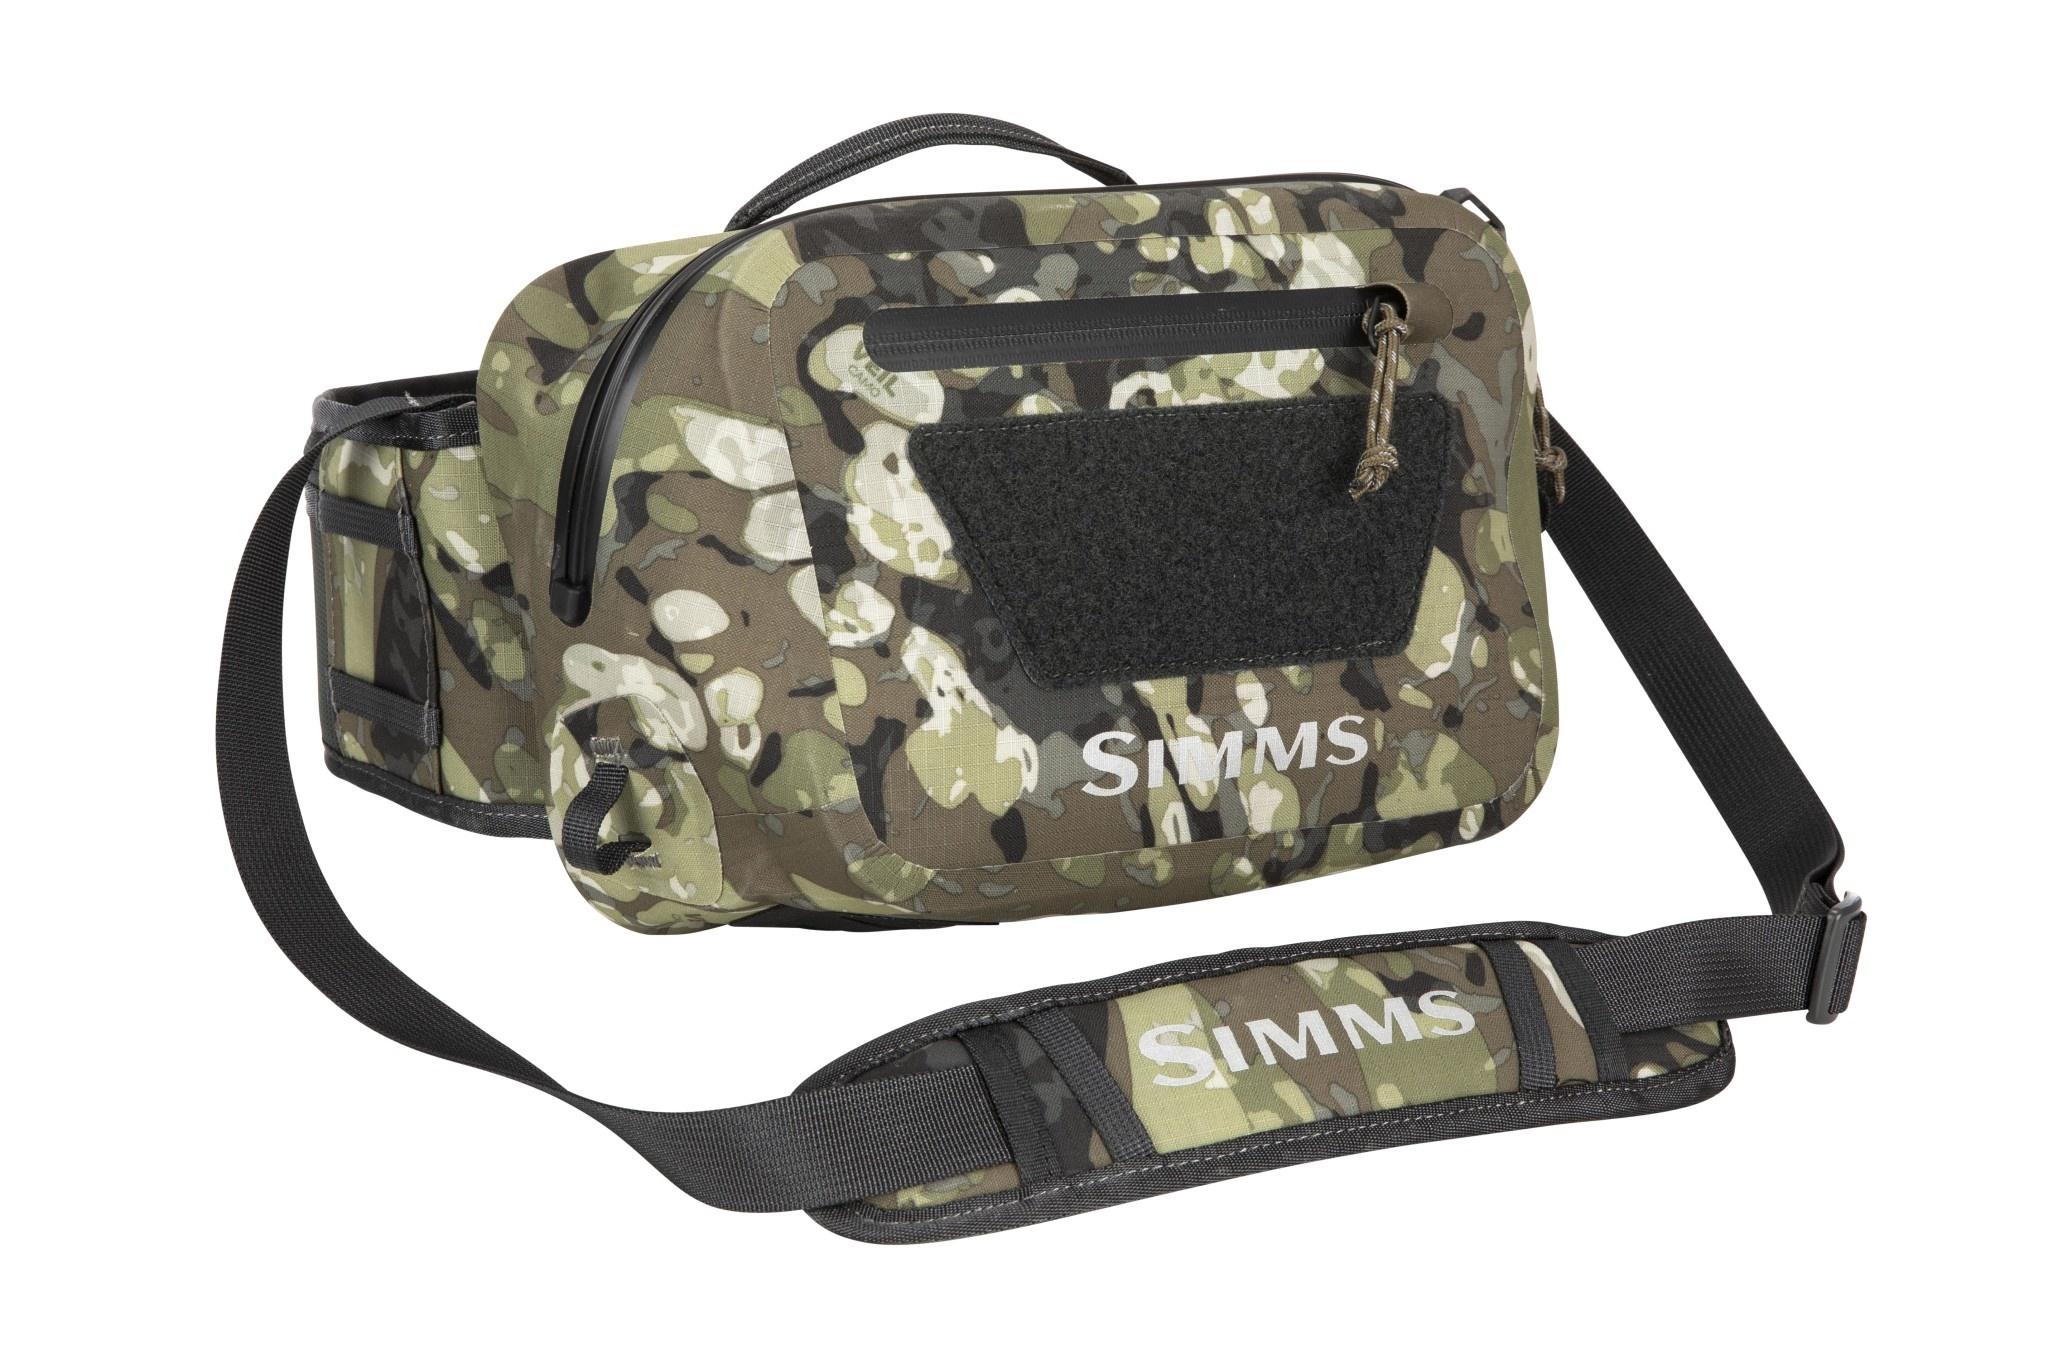 Simms Simms Dry Creek Z Hip Pack